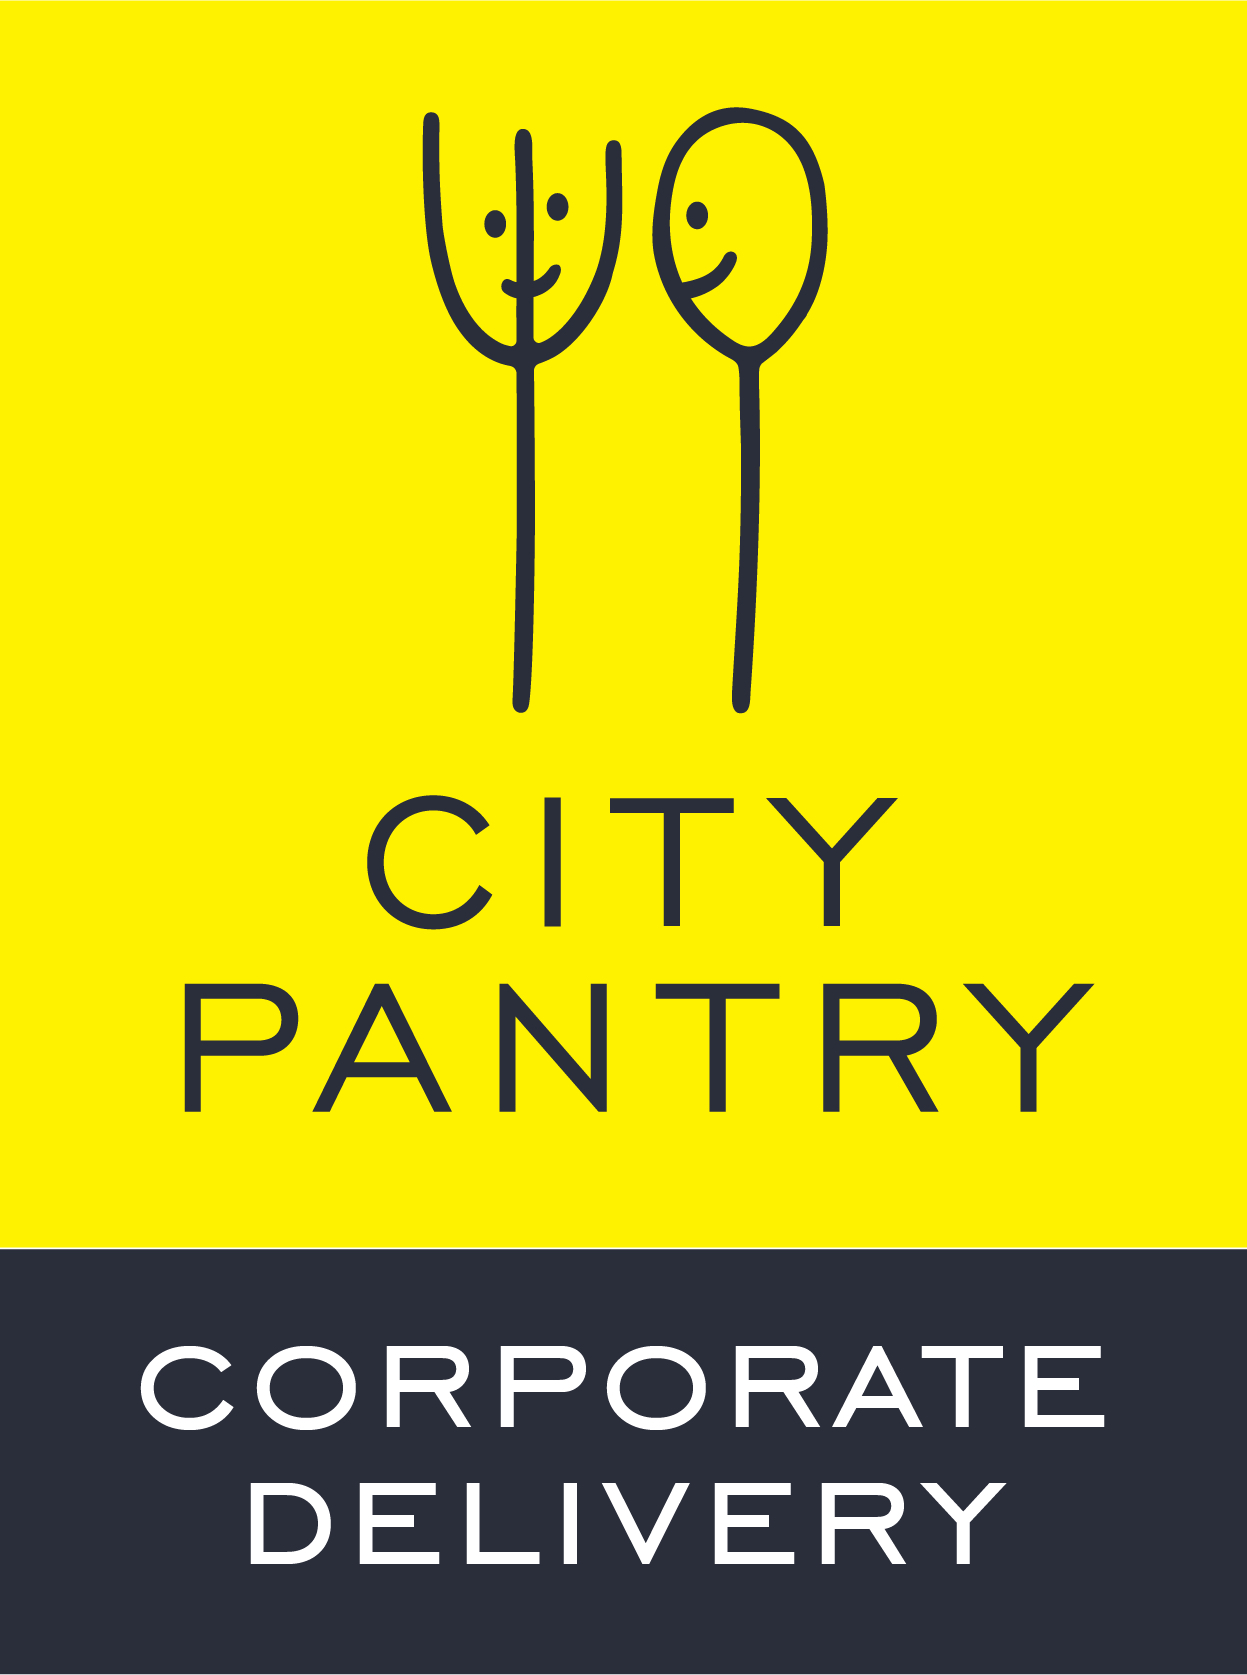 https://citypantry.com/menus/vendors/rock-my-bowl/menu?date=2018-10-22T13%3A00&utm_source=referral&utm_campaign=vendor-backlink